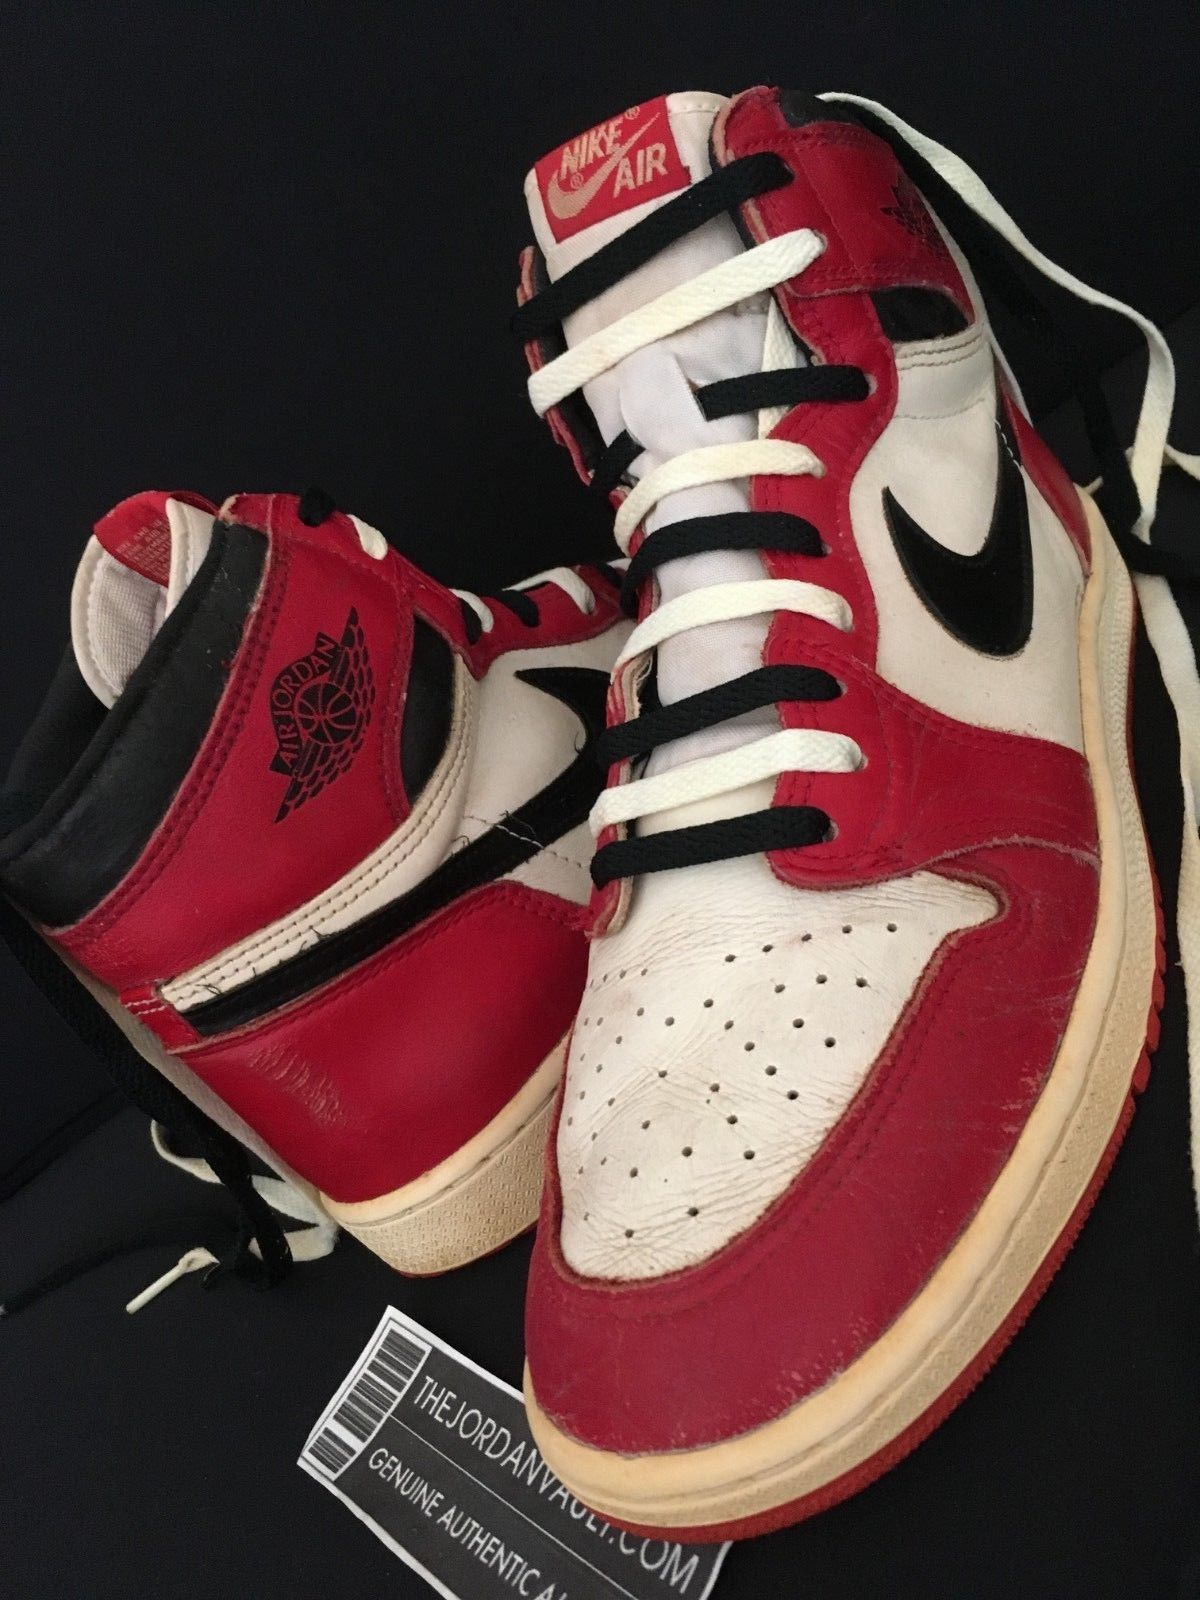 cheap for discount 44ed6 b1de1 1985 Nike Air Jordan 1 Original White Black Red Chicago sz. 12